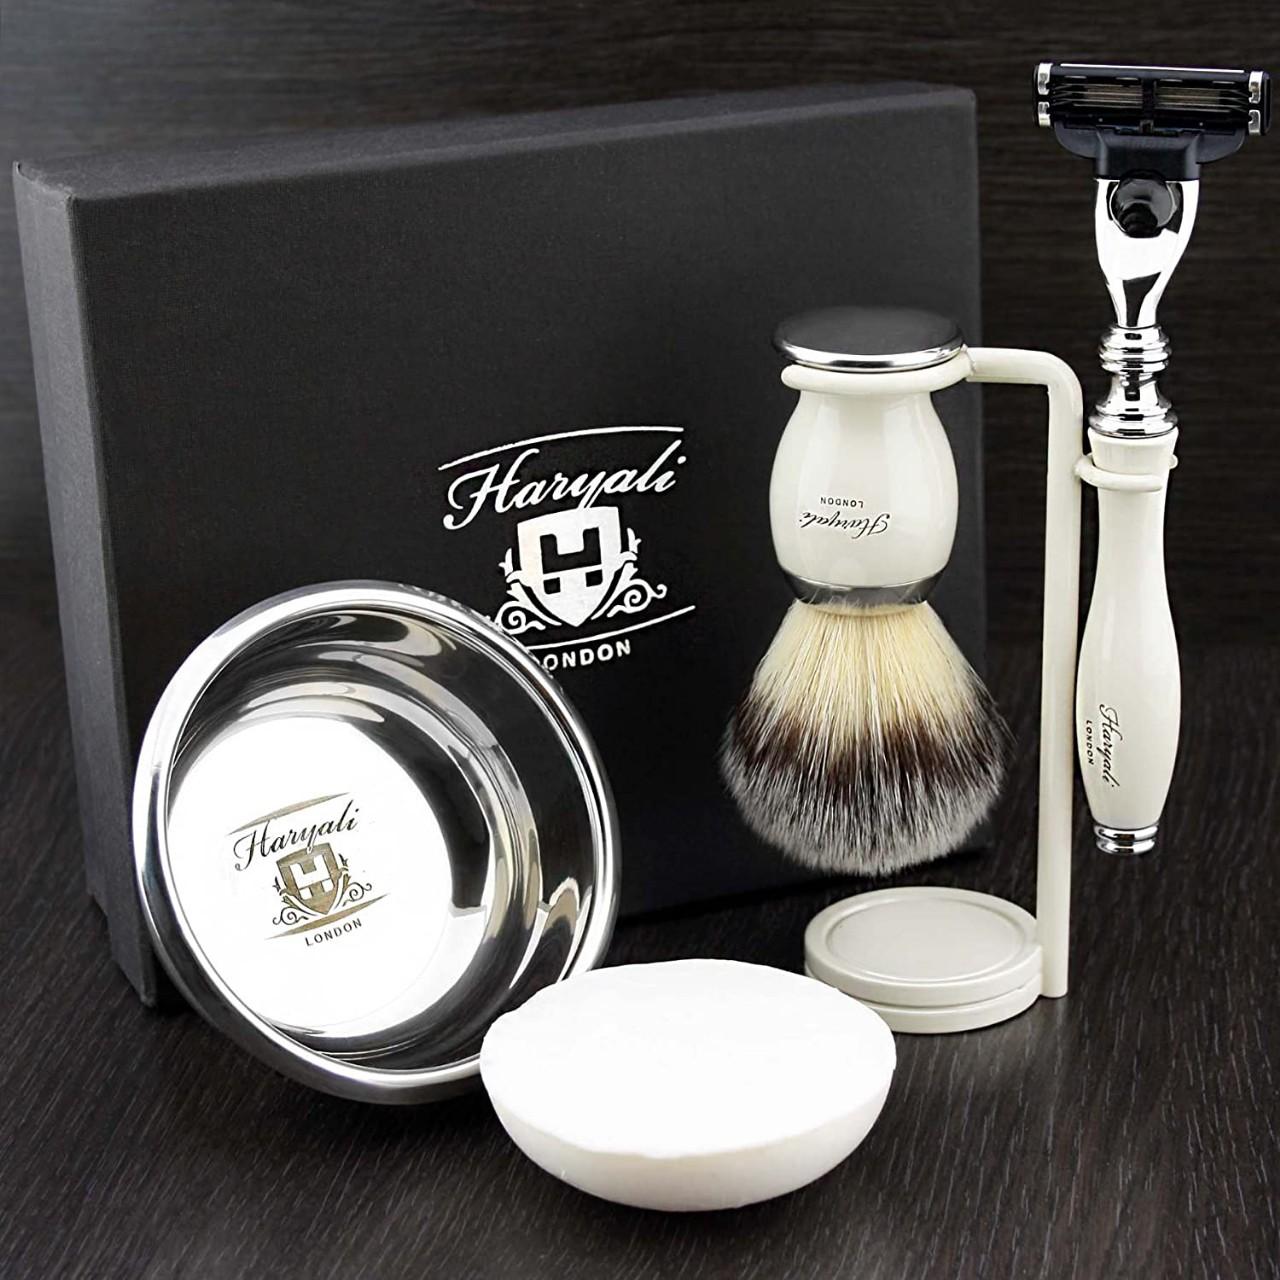 Haryali London 5 Pc Mens Shaving Kit 3 Edge Razor with Synthetic Badger Hair Shaving Brush, Stand